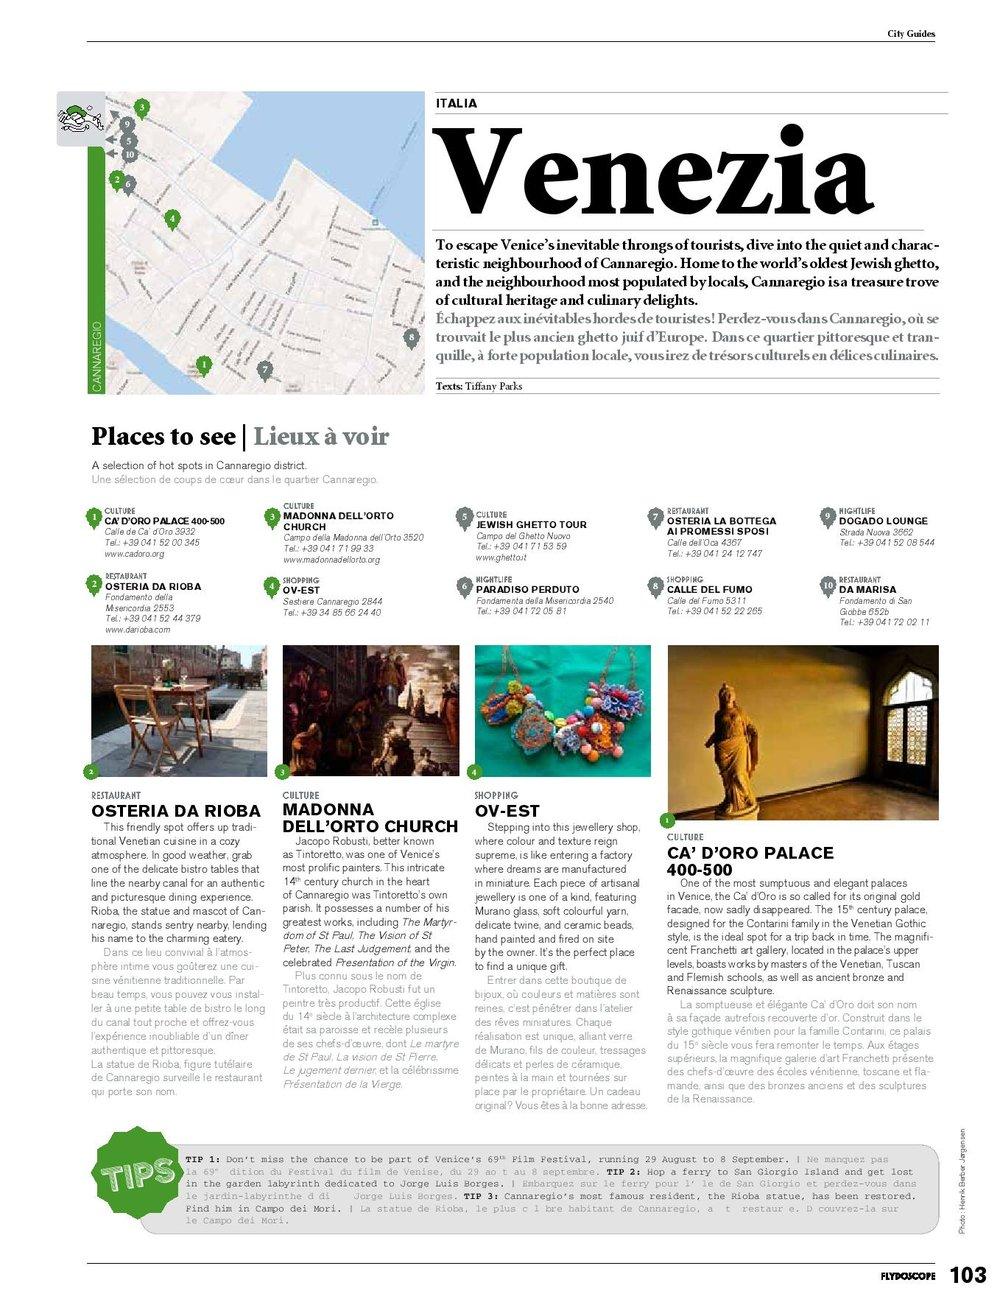 Venezia-Canareggio-Flydo-2012-no3.jpg